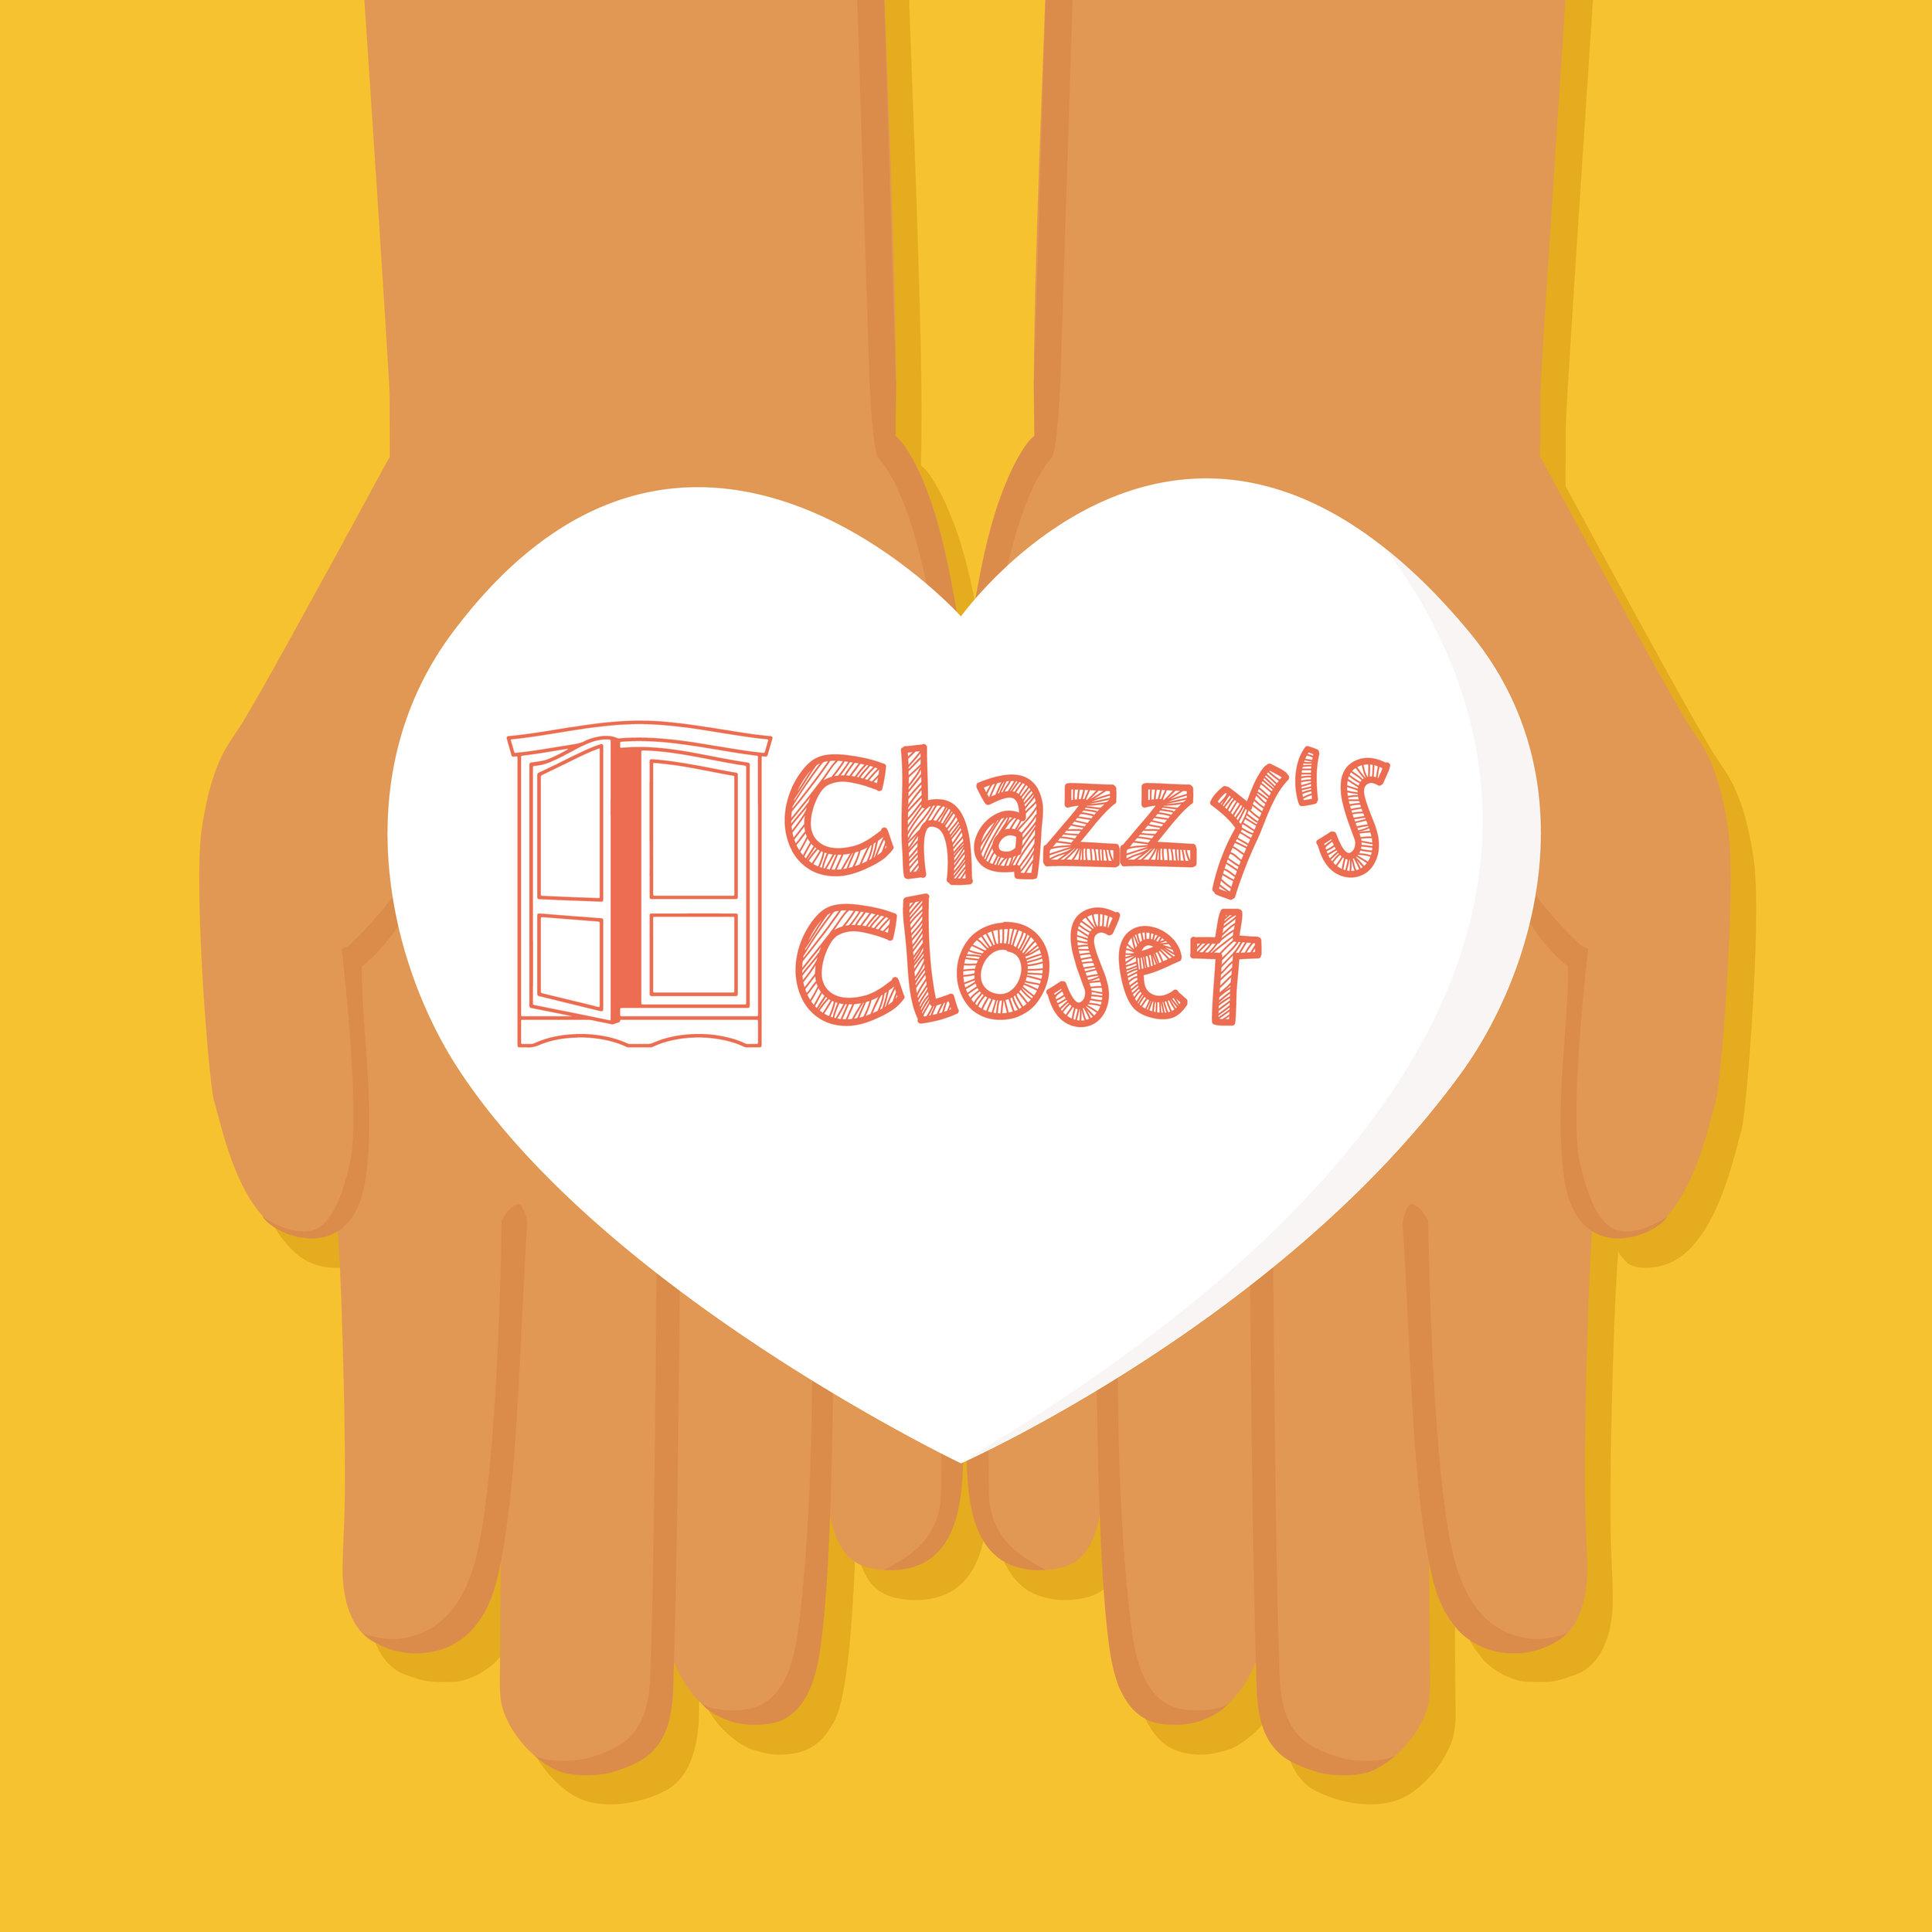 212771_Chazzy'sCloset-v3_41218.jpg